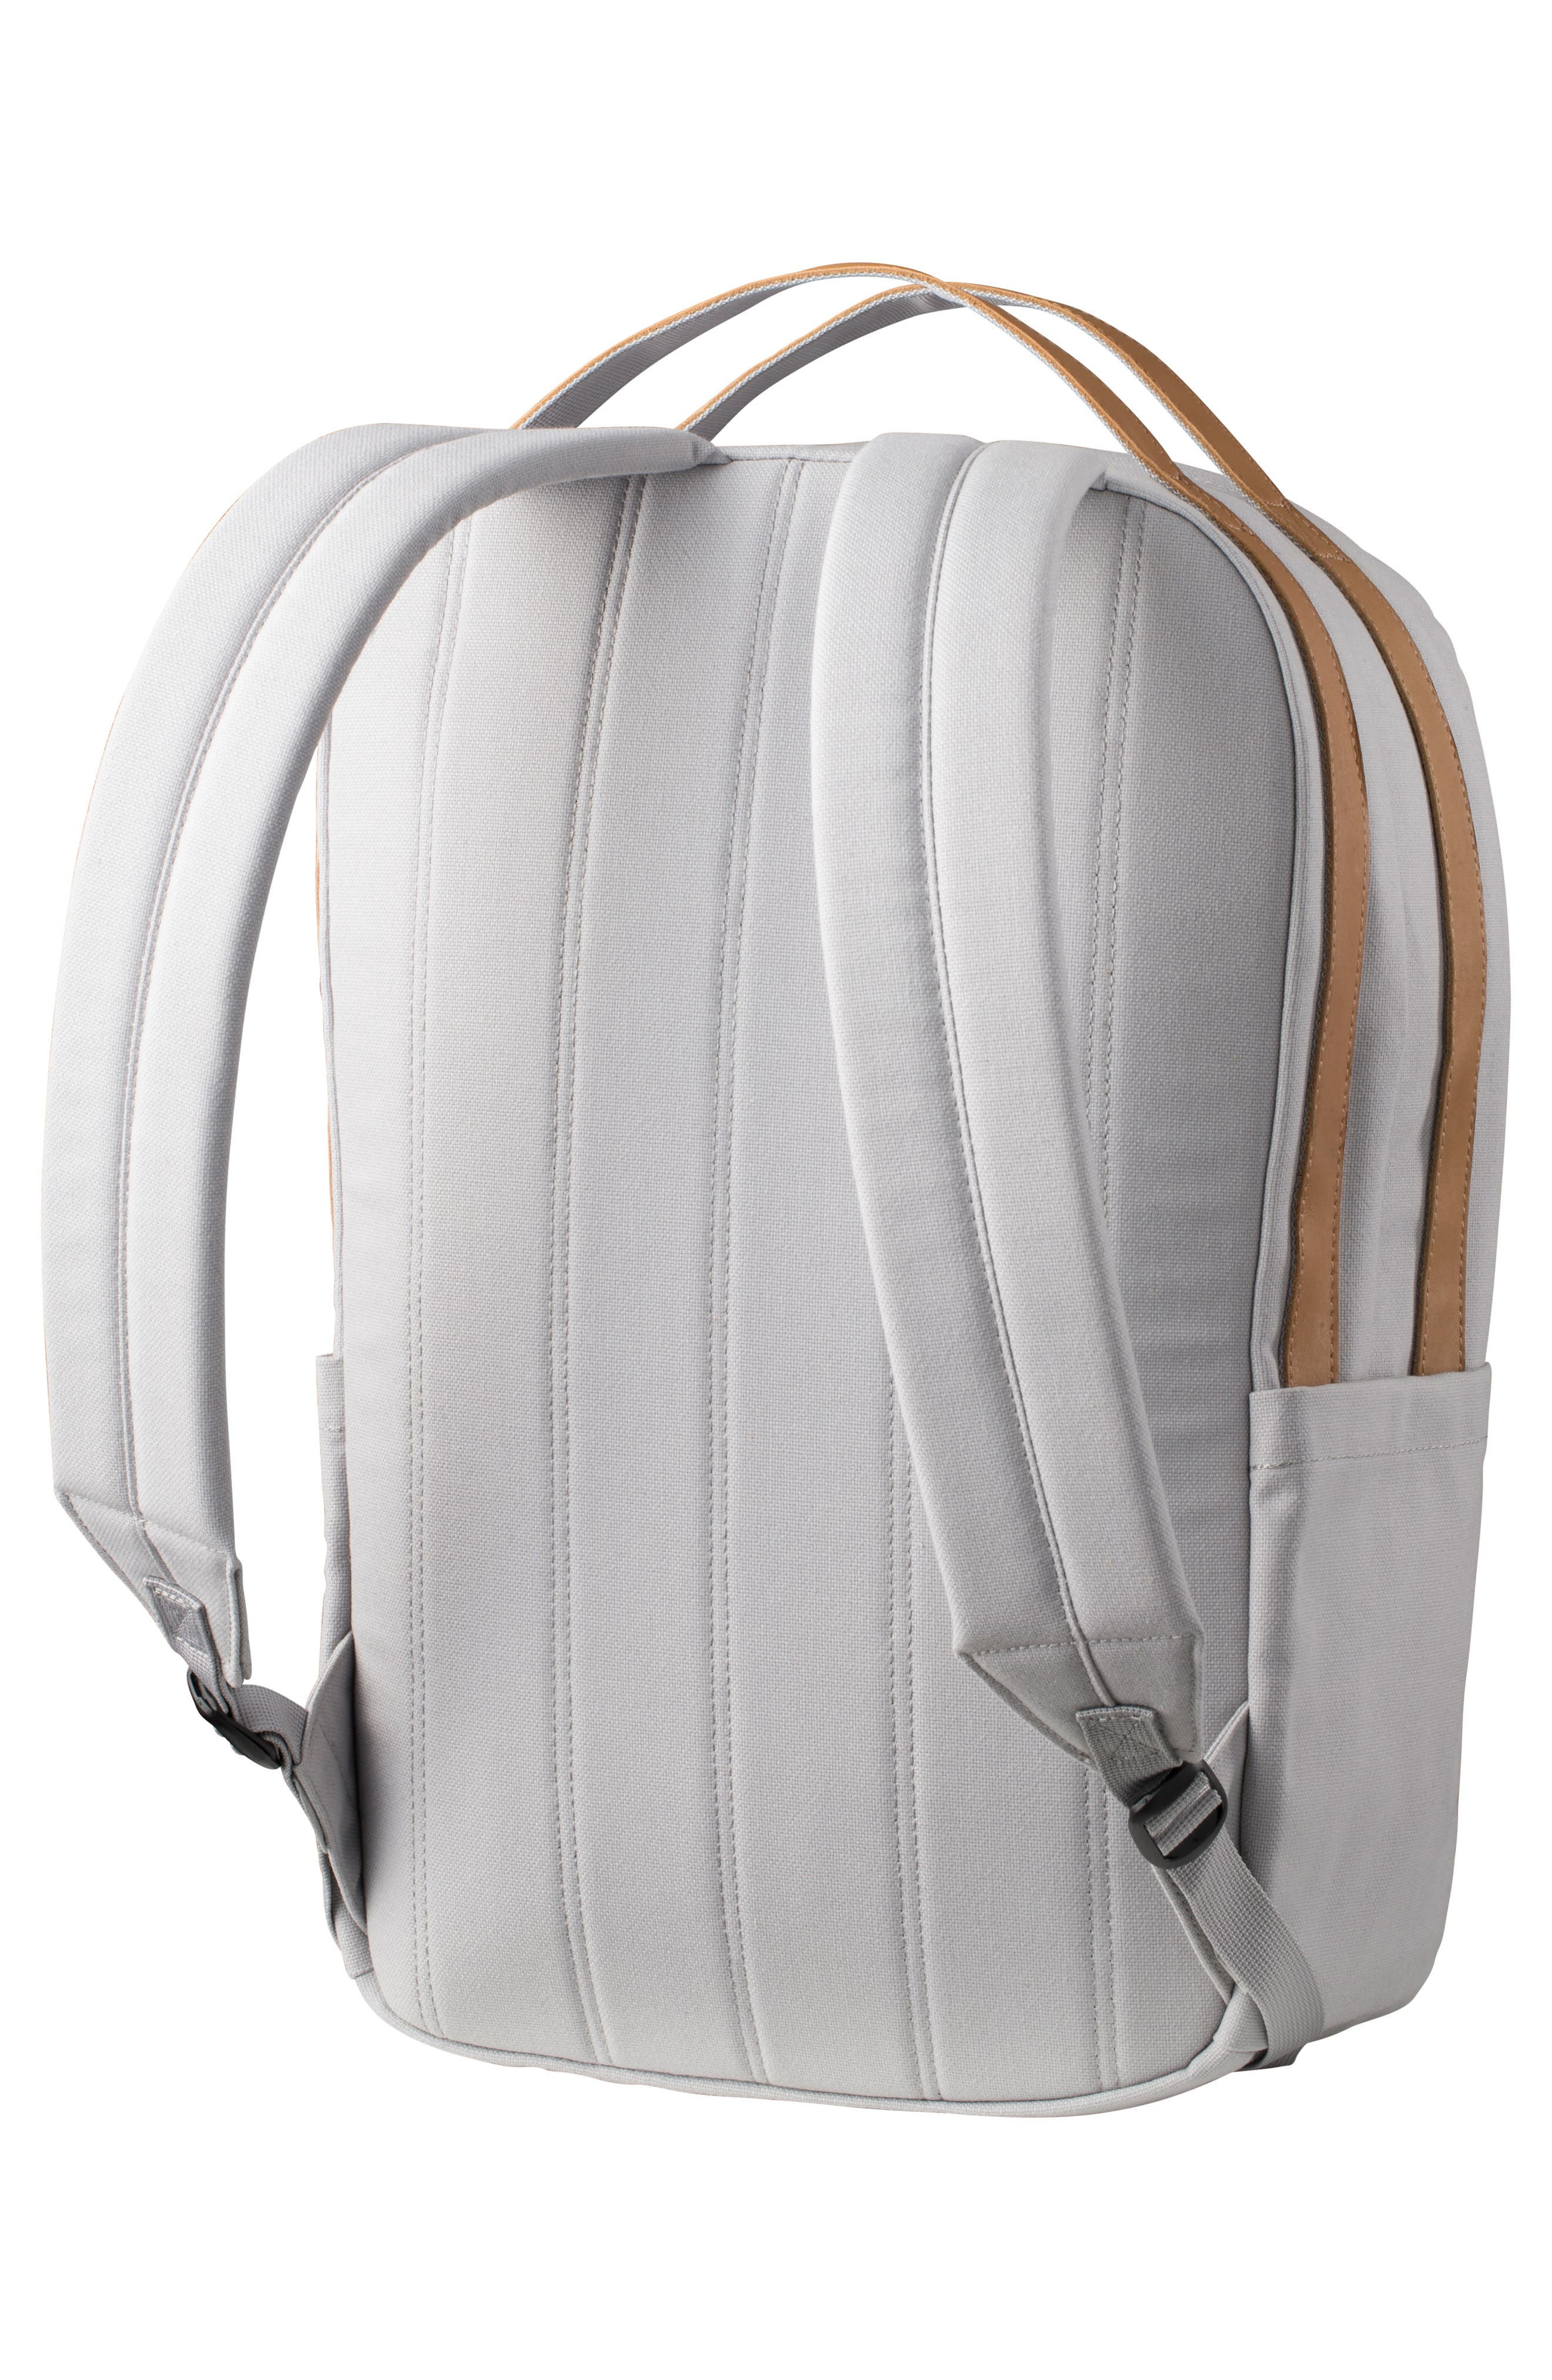 Copenhagen Backpack,                             Alternate thumbnail 2, color,                             SILVER GREY